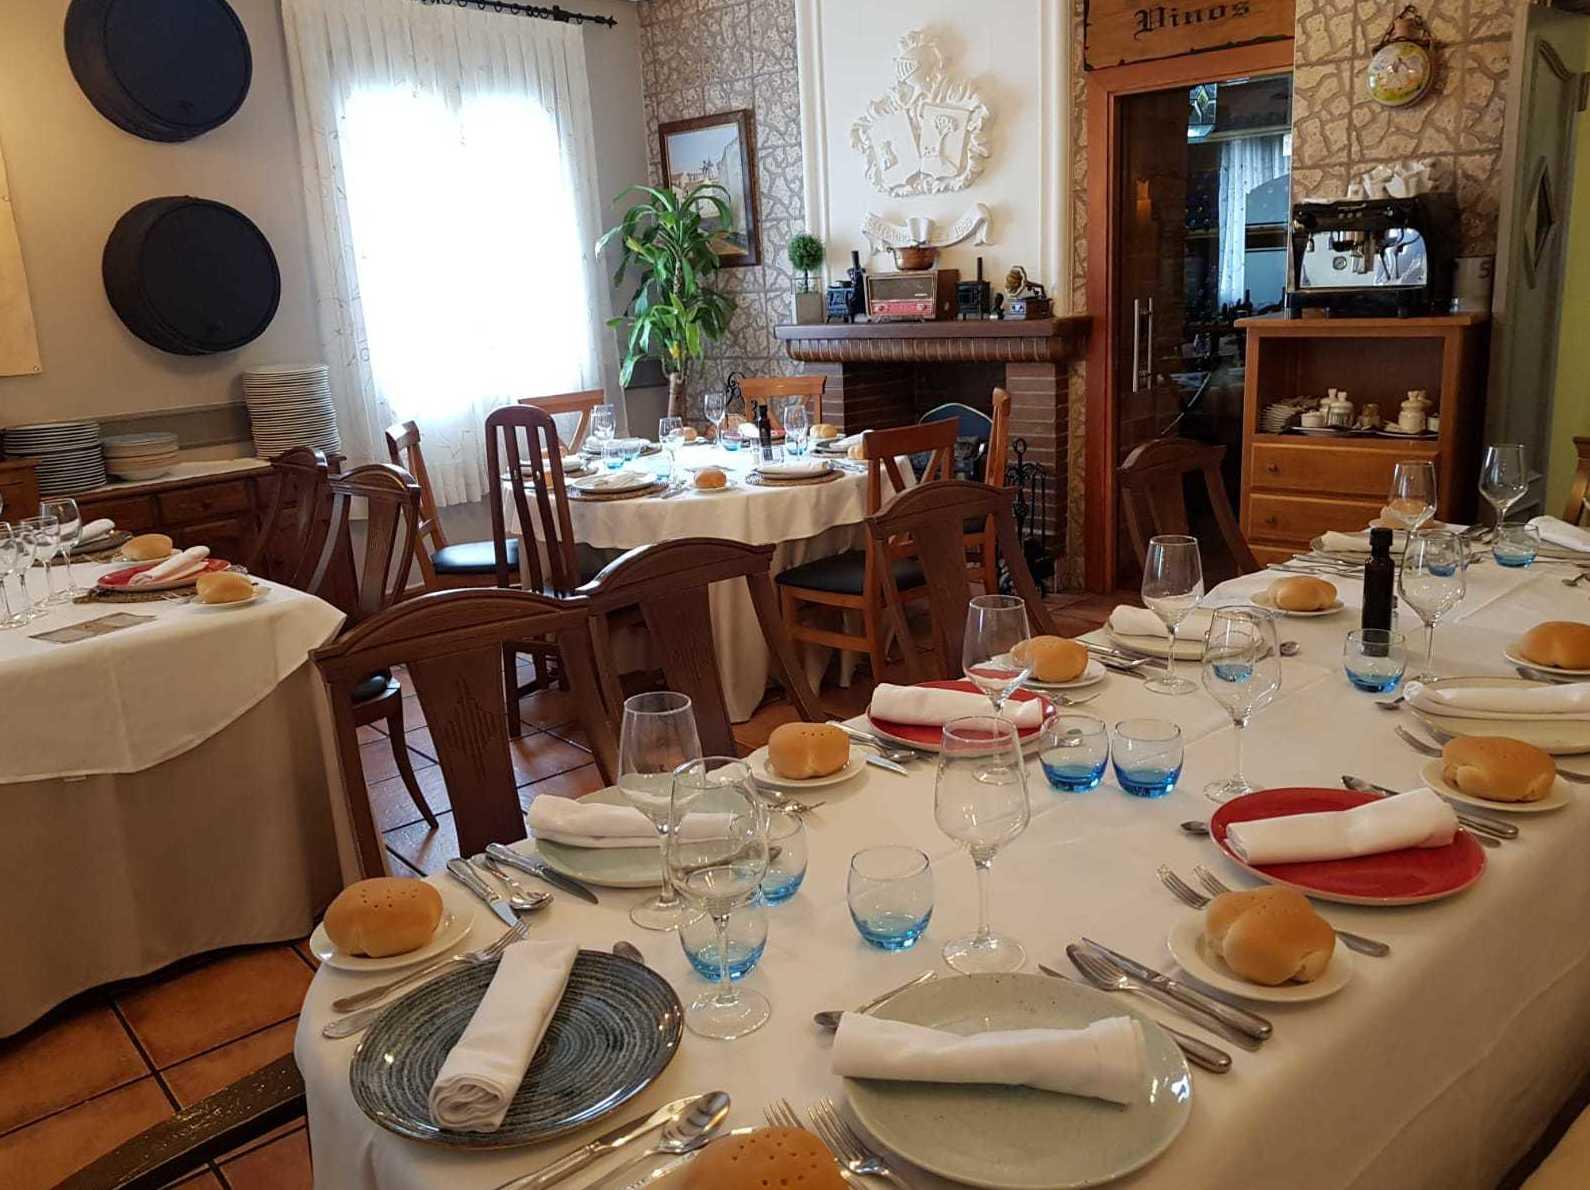 Foto 8 de Cocina castellano-manchega en Tomelloso | Restaurante Casa Justo